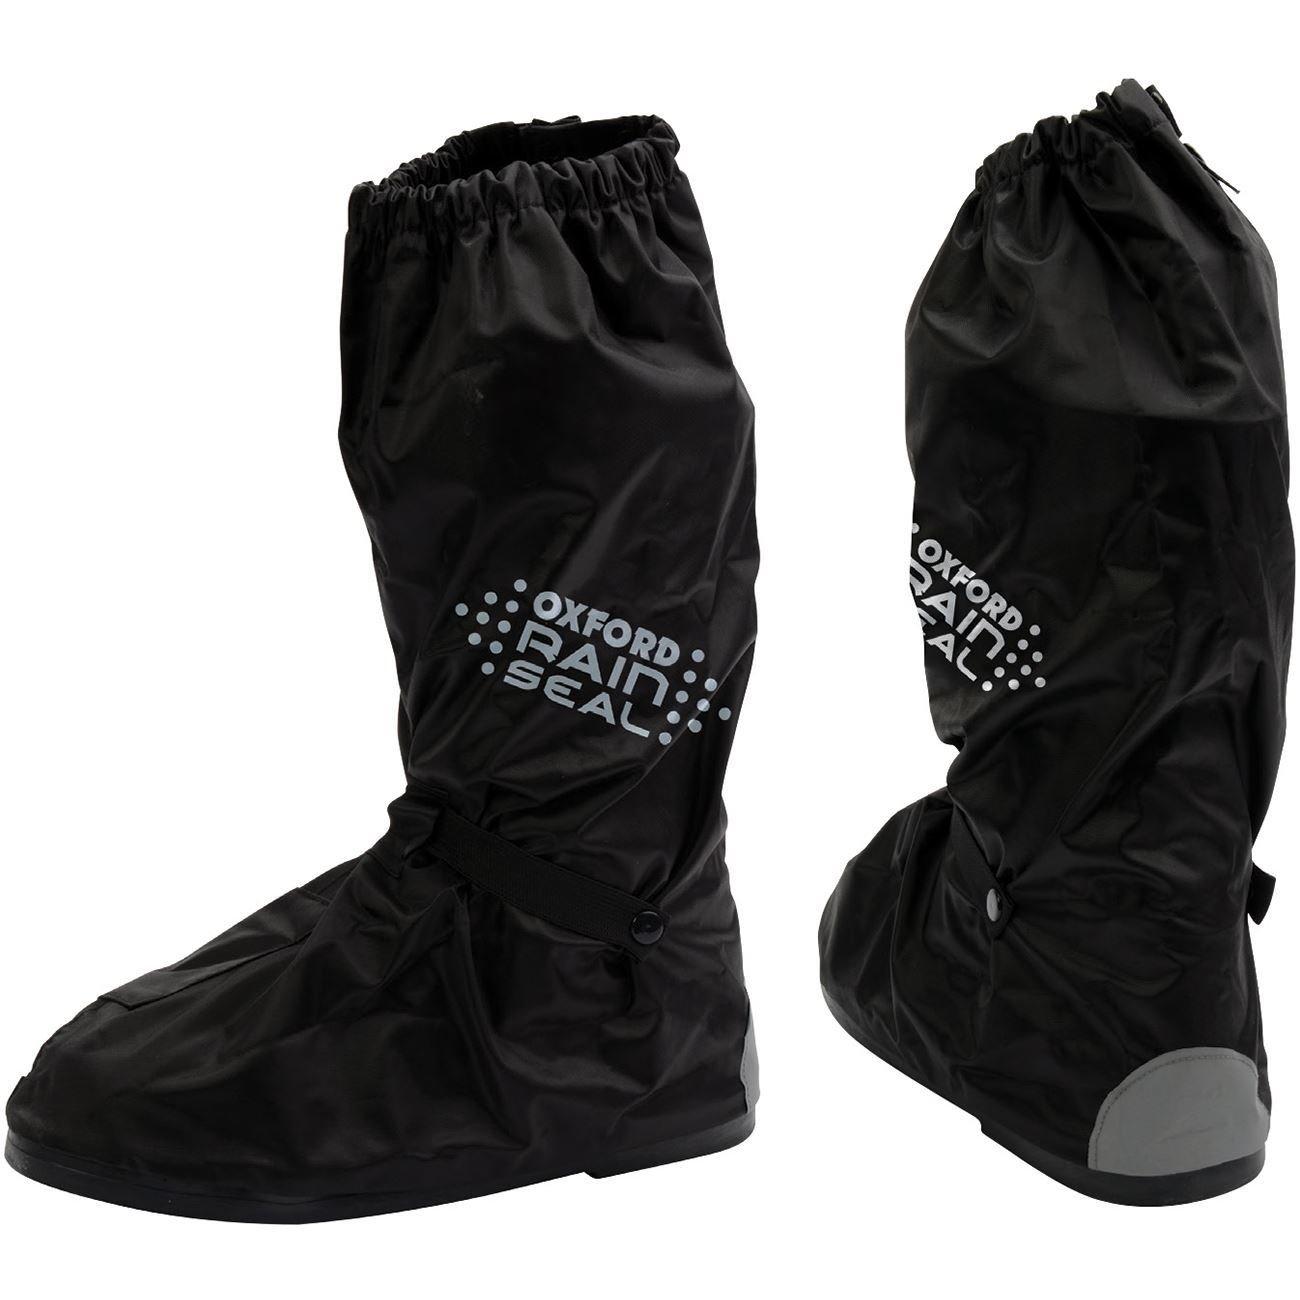 Oxford Rainseal Waterproof Motorcycle Over Boots - Black